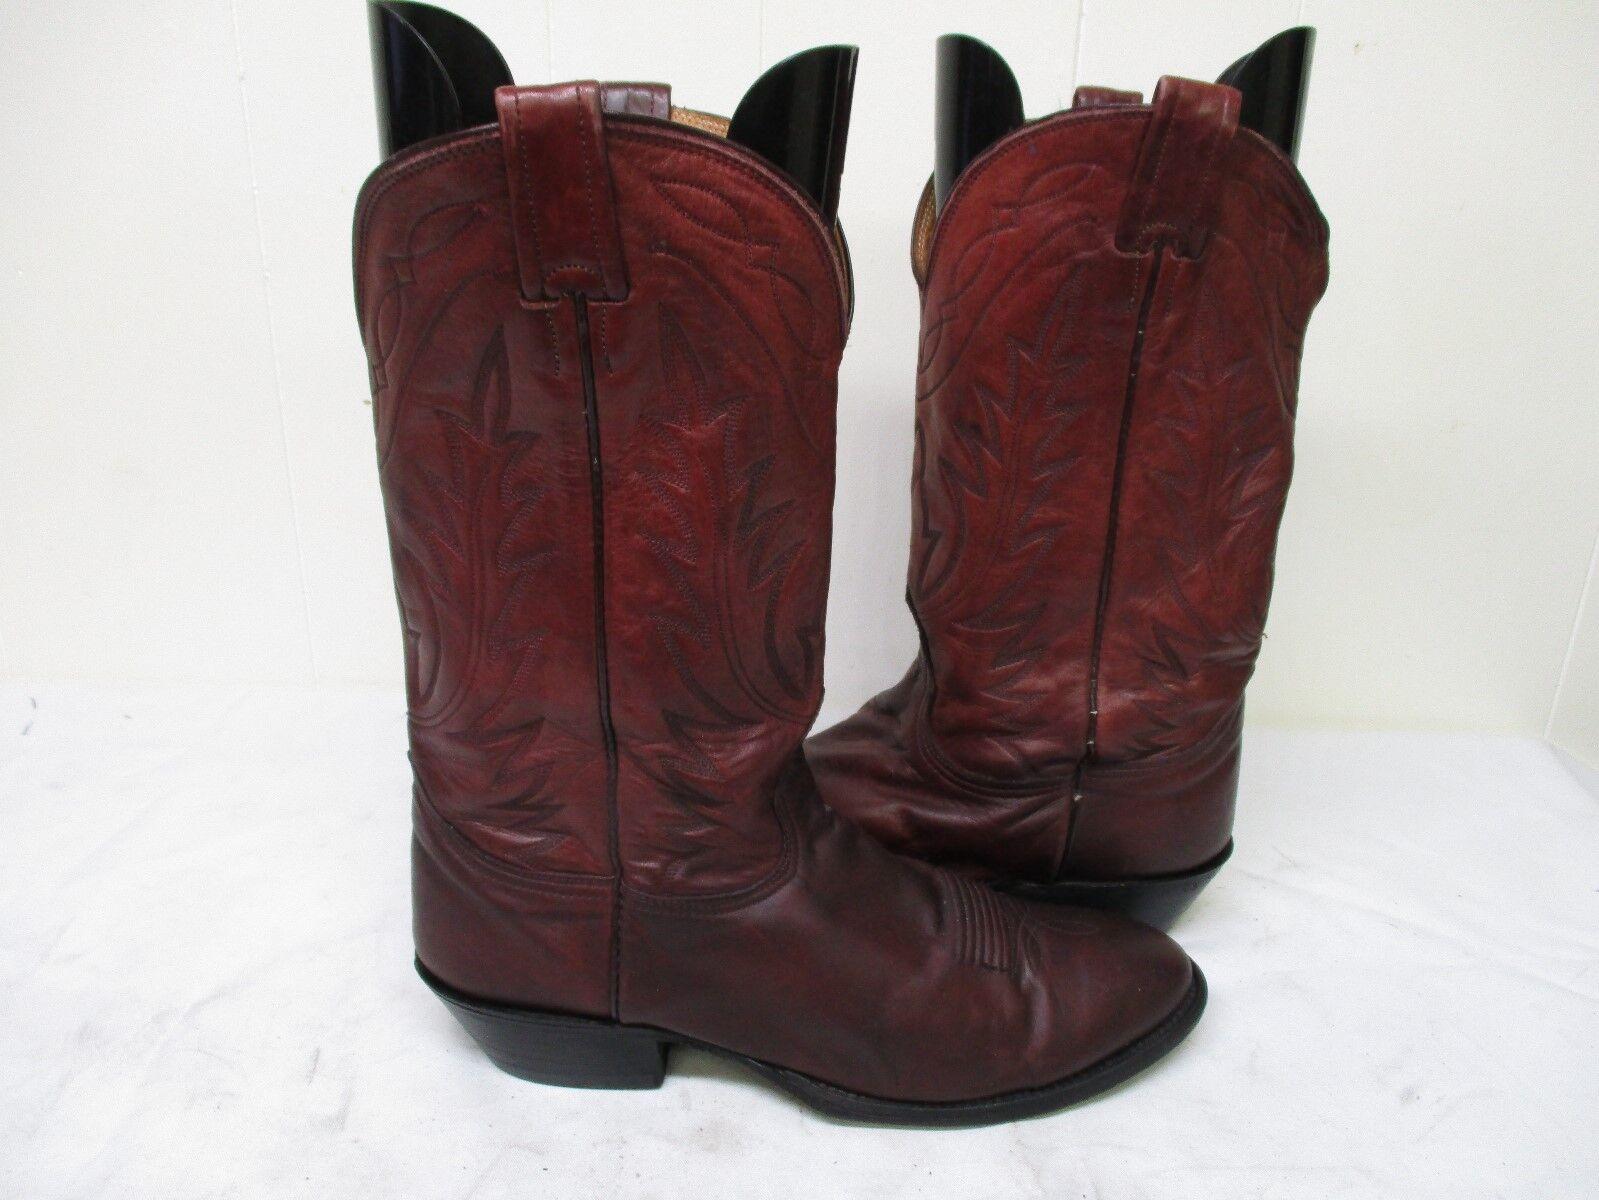 Nocona London Tan Soft Leather Cowboy Boots Size 10 D Style T820C USA